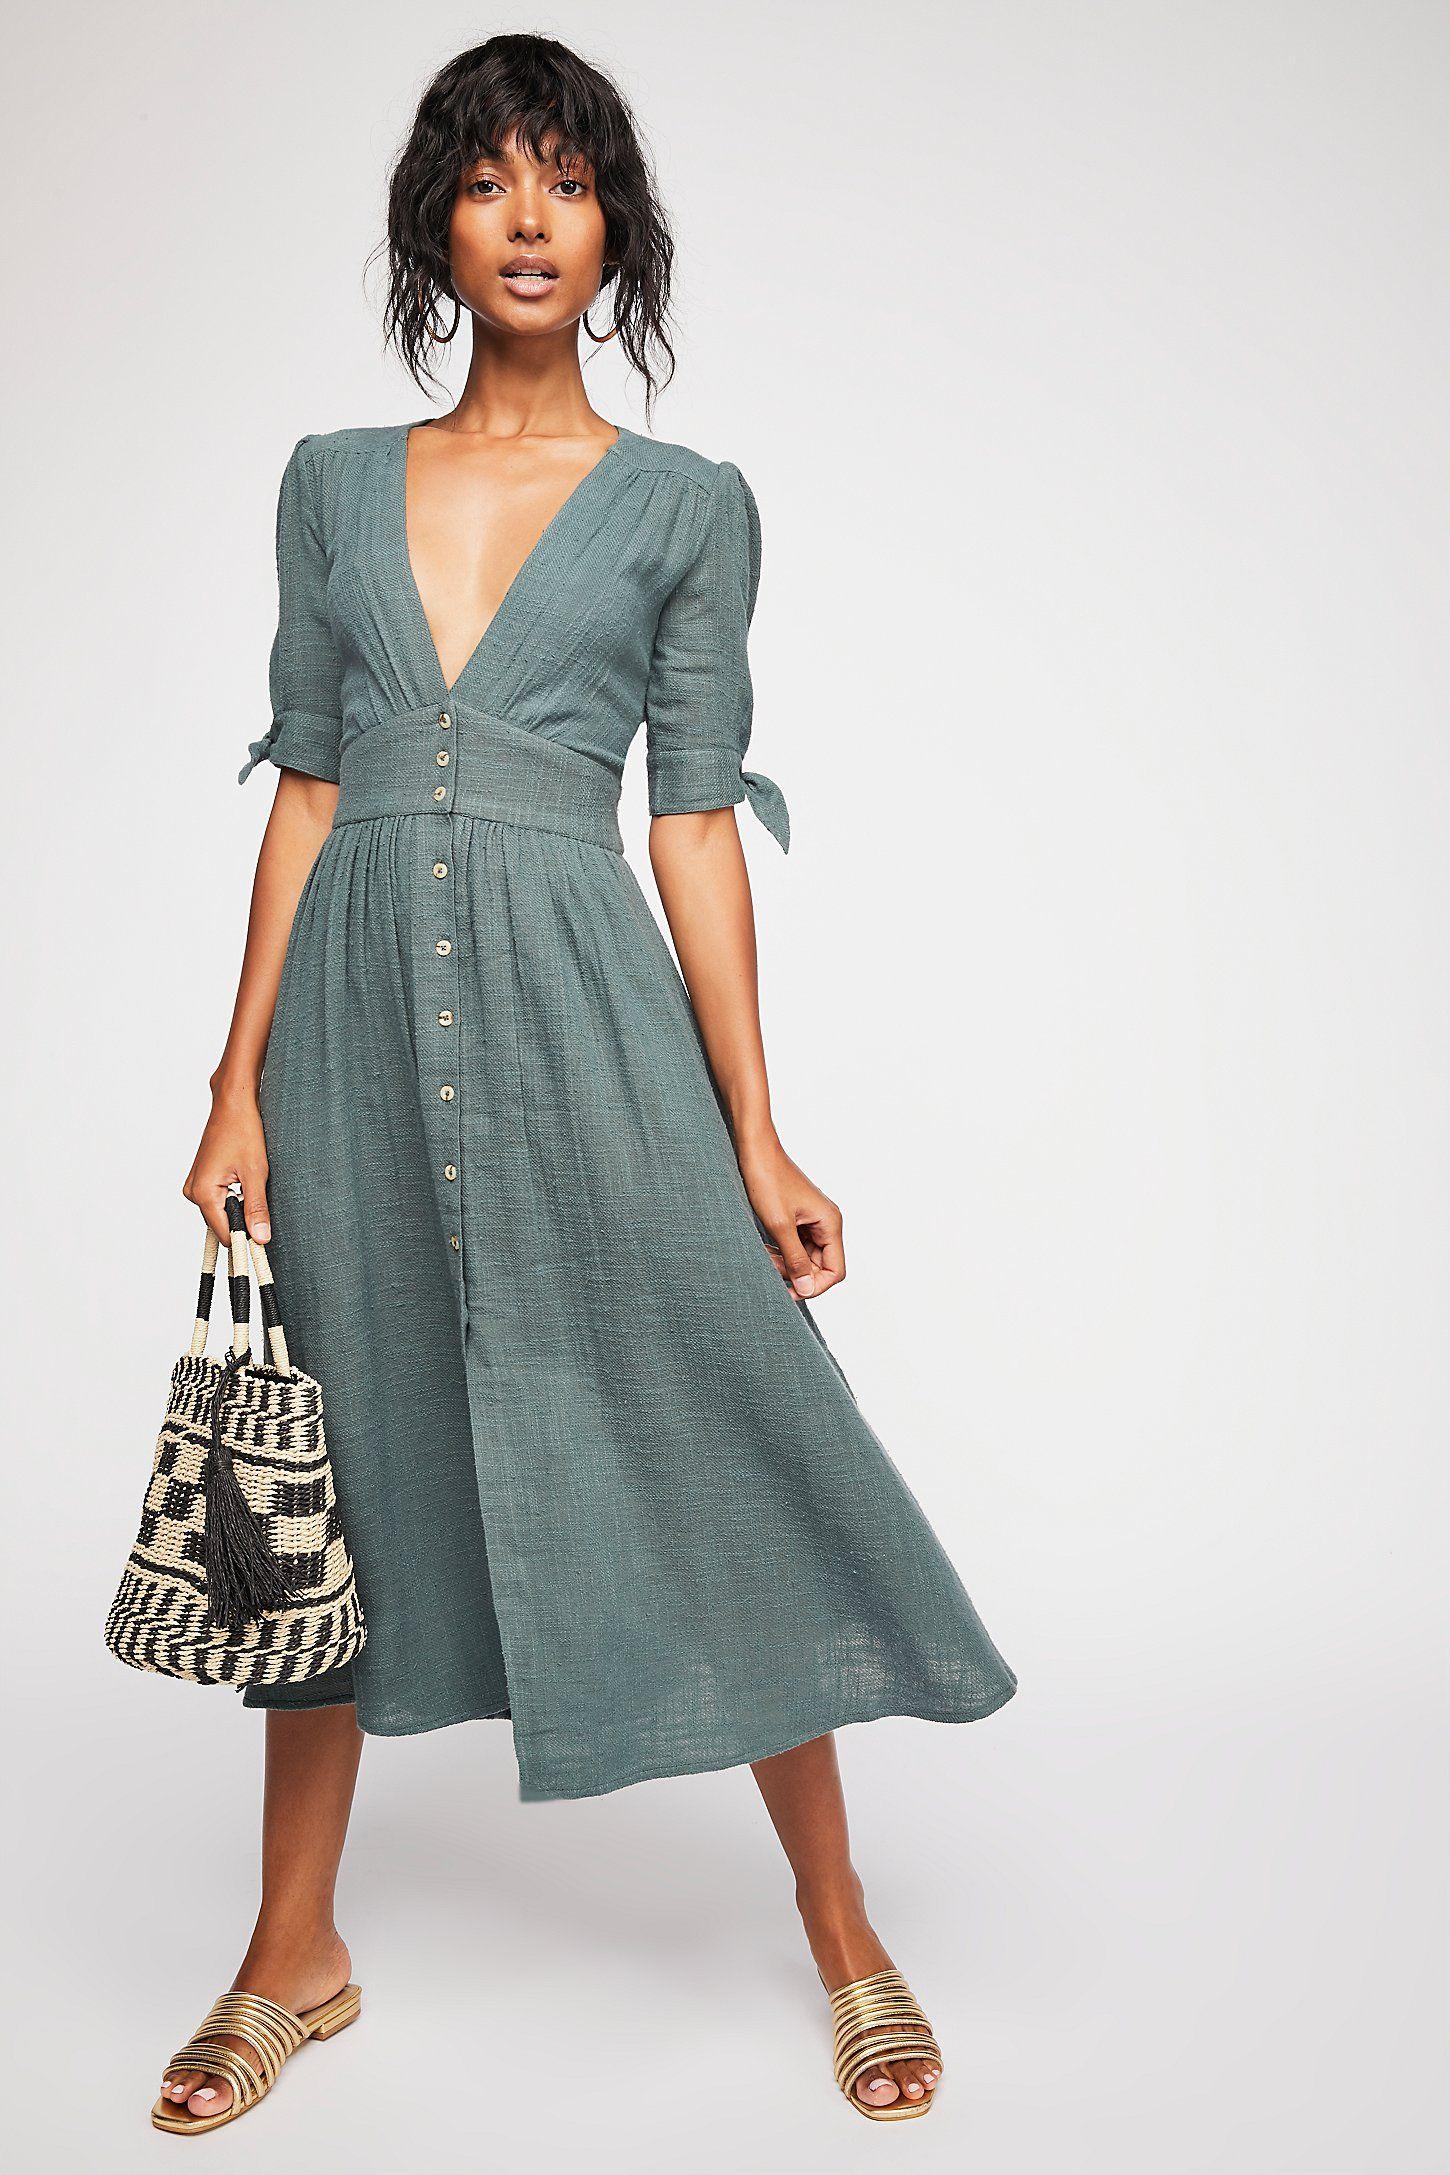 Love Of My Life Midi Dress Casual Dresses For Women Midi Dress Summer Celebrity Dresses [ 2175 x 1450 Pixel ]